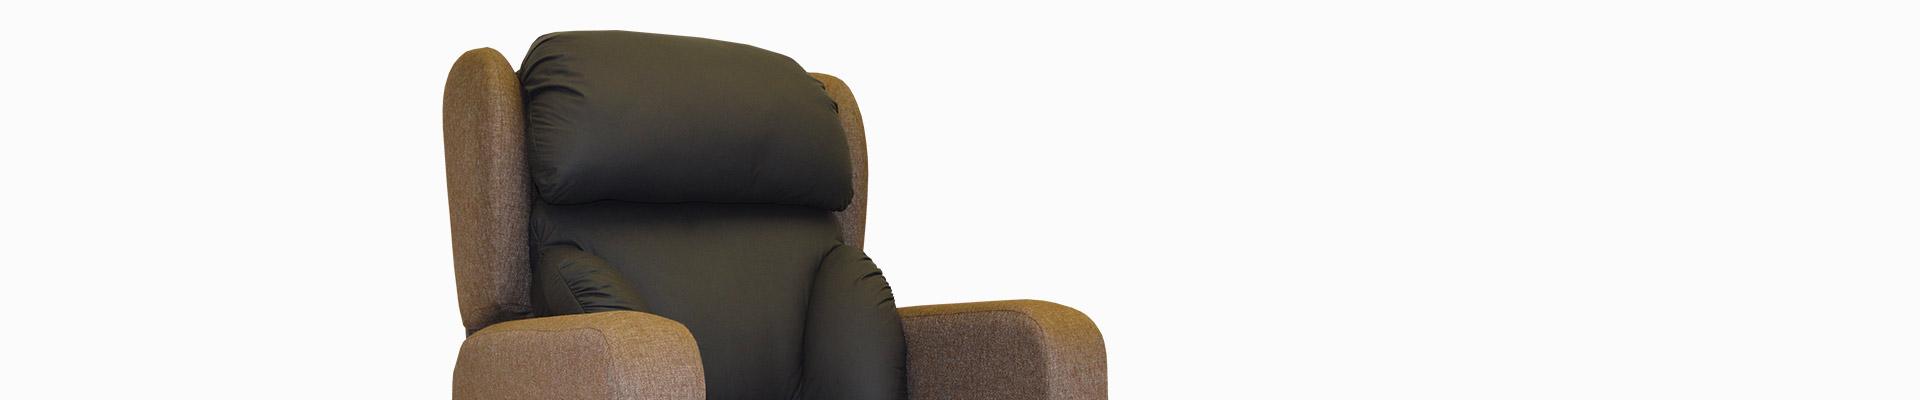 homecare-ecoflex-featured-image